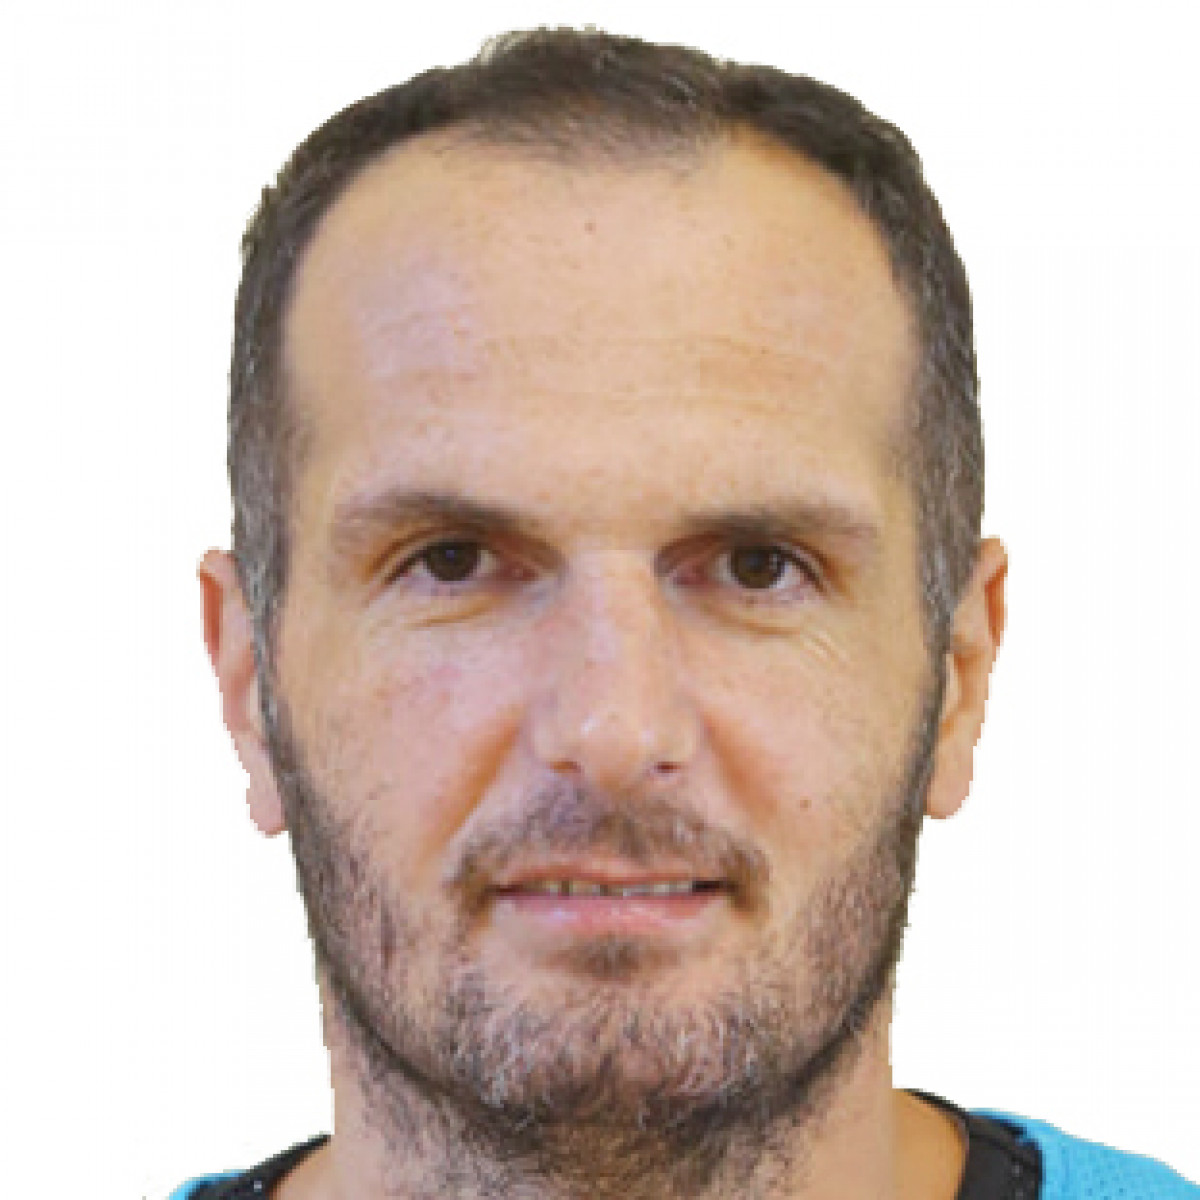 Radomir Marojevic